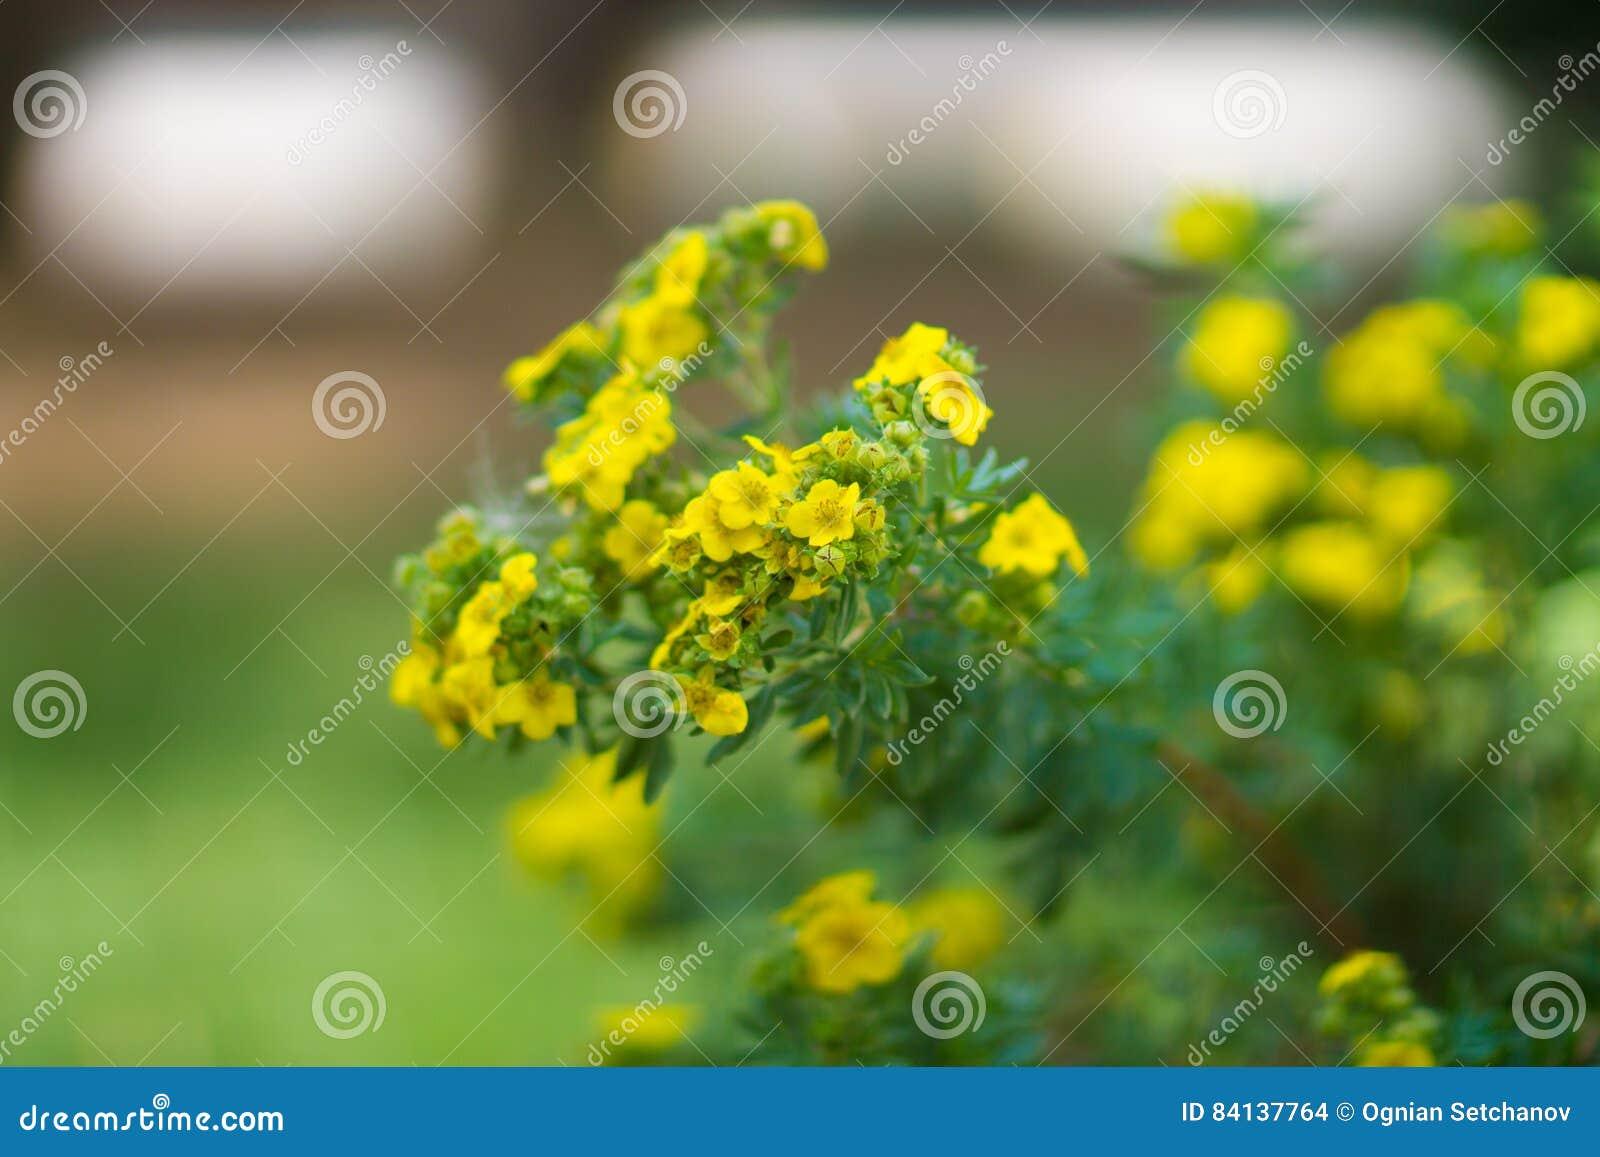 Tiny Yellow Flowers Stock Photo Image Of Wilderness 84137764